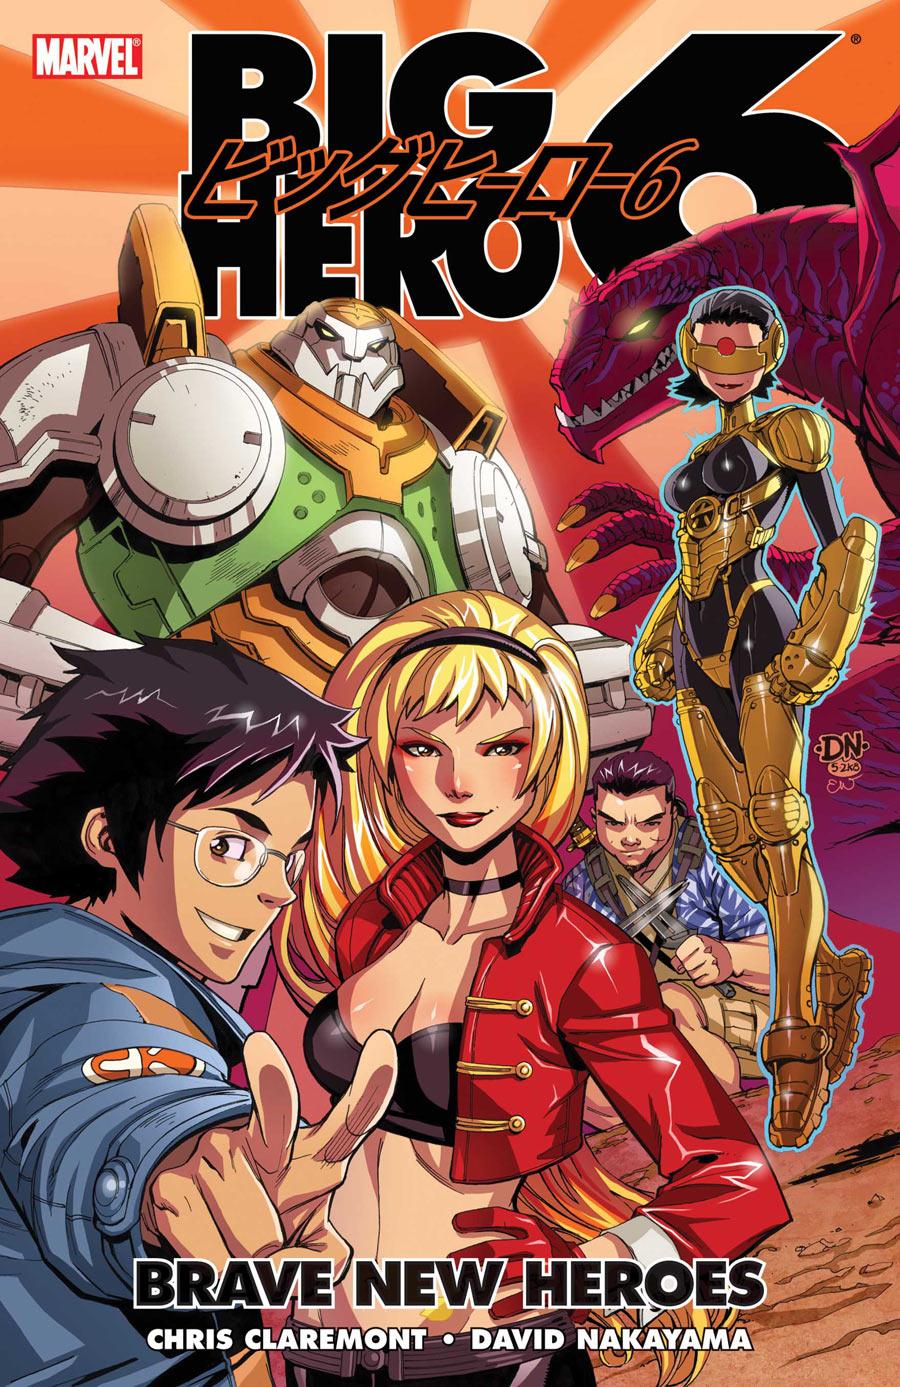 Japanese Superheroes of Japanese Superheroes